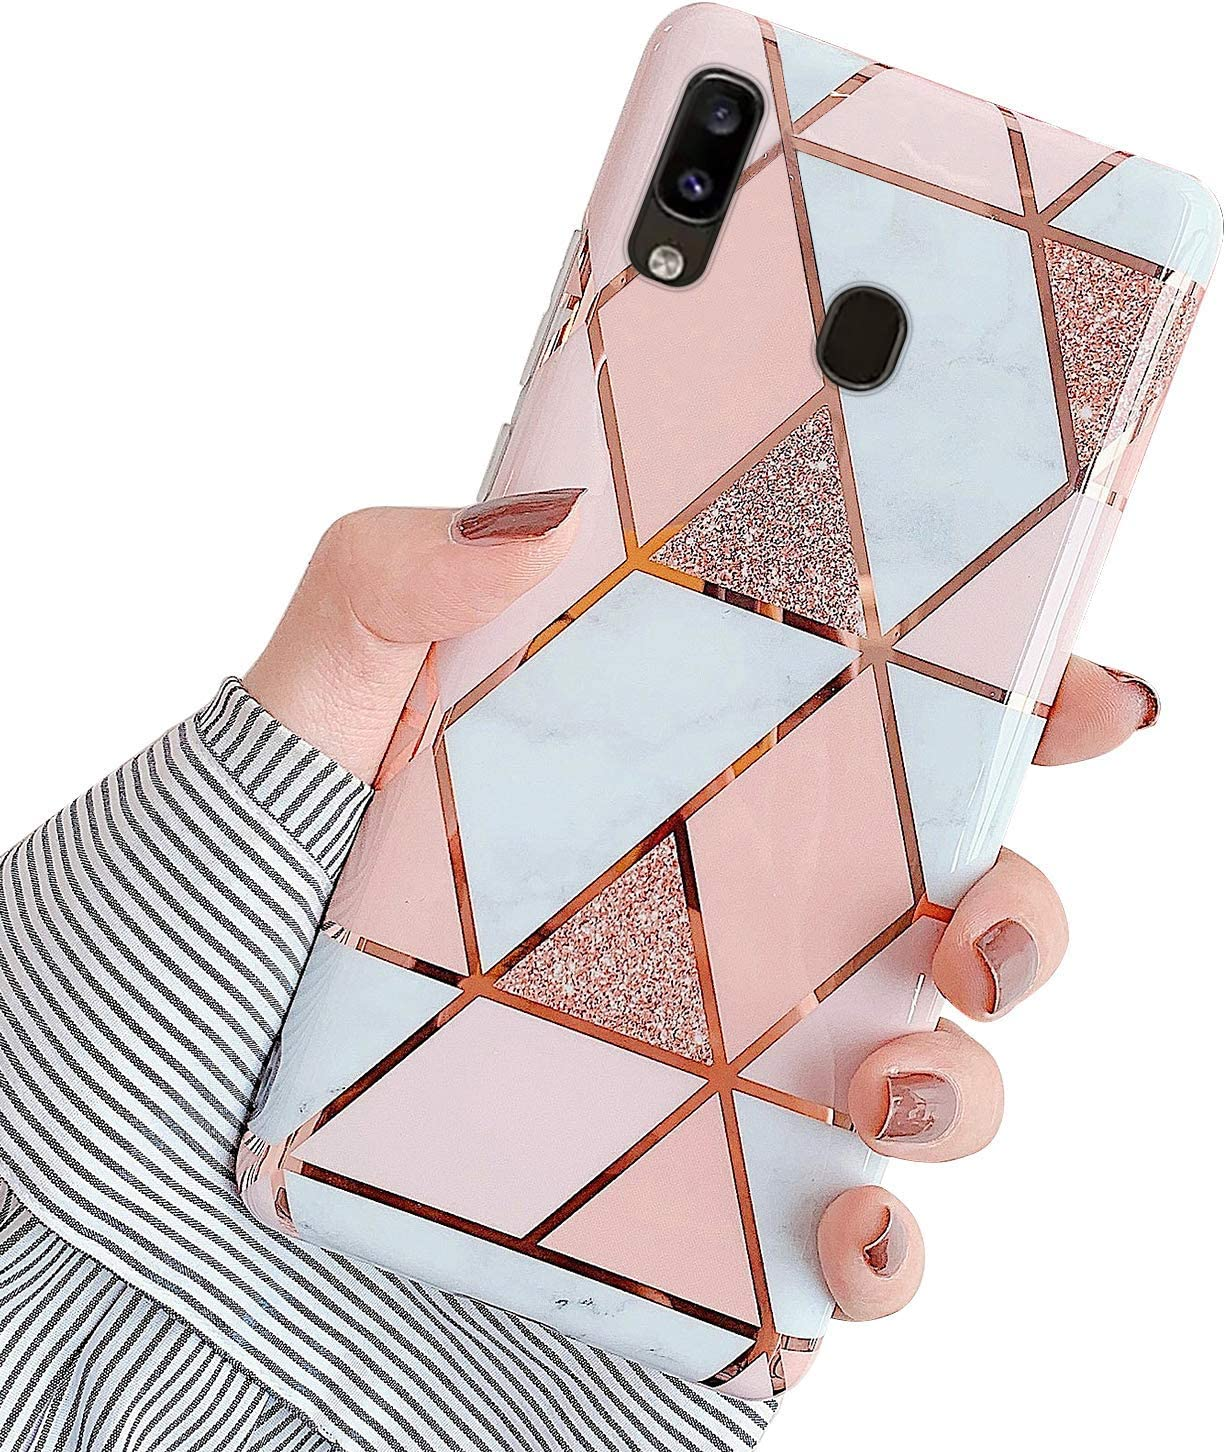 MoreChioce H/ülle kompatibel mit Samsung Galaxy A30//Galaxy A20 Marmor H/ülle Bling Glitzer Paillette Weich Silikon Handyh/ülle mit 360 Grad Ring St/änder Flexible Schutzh/ülle Transparent Bumper Schwarz